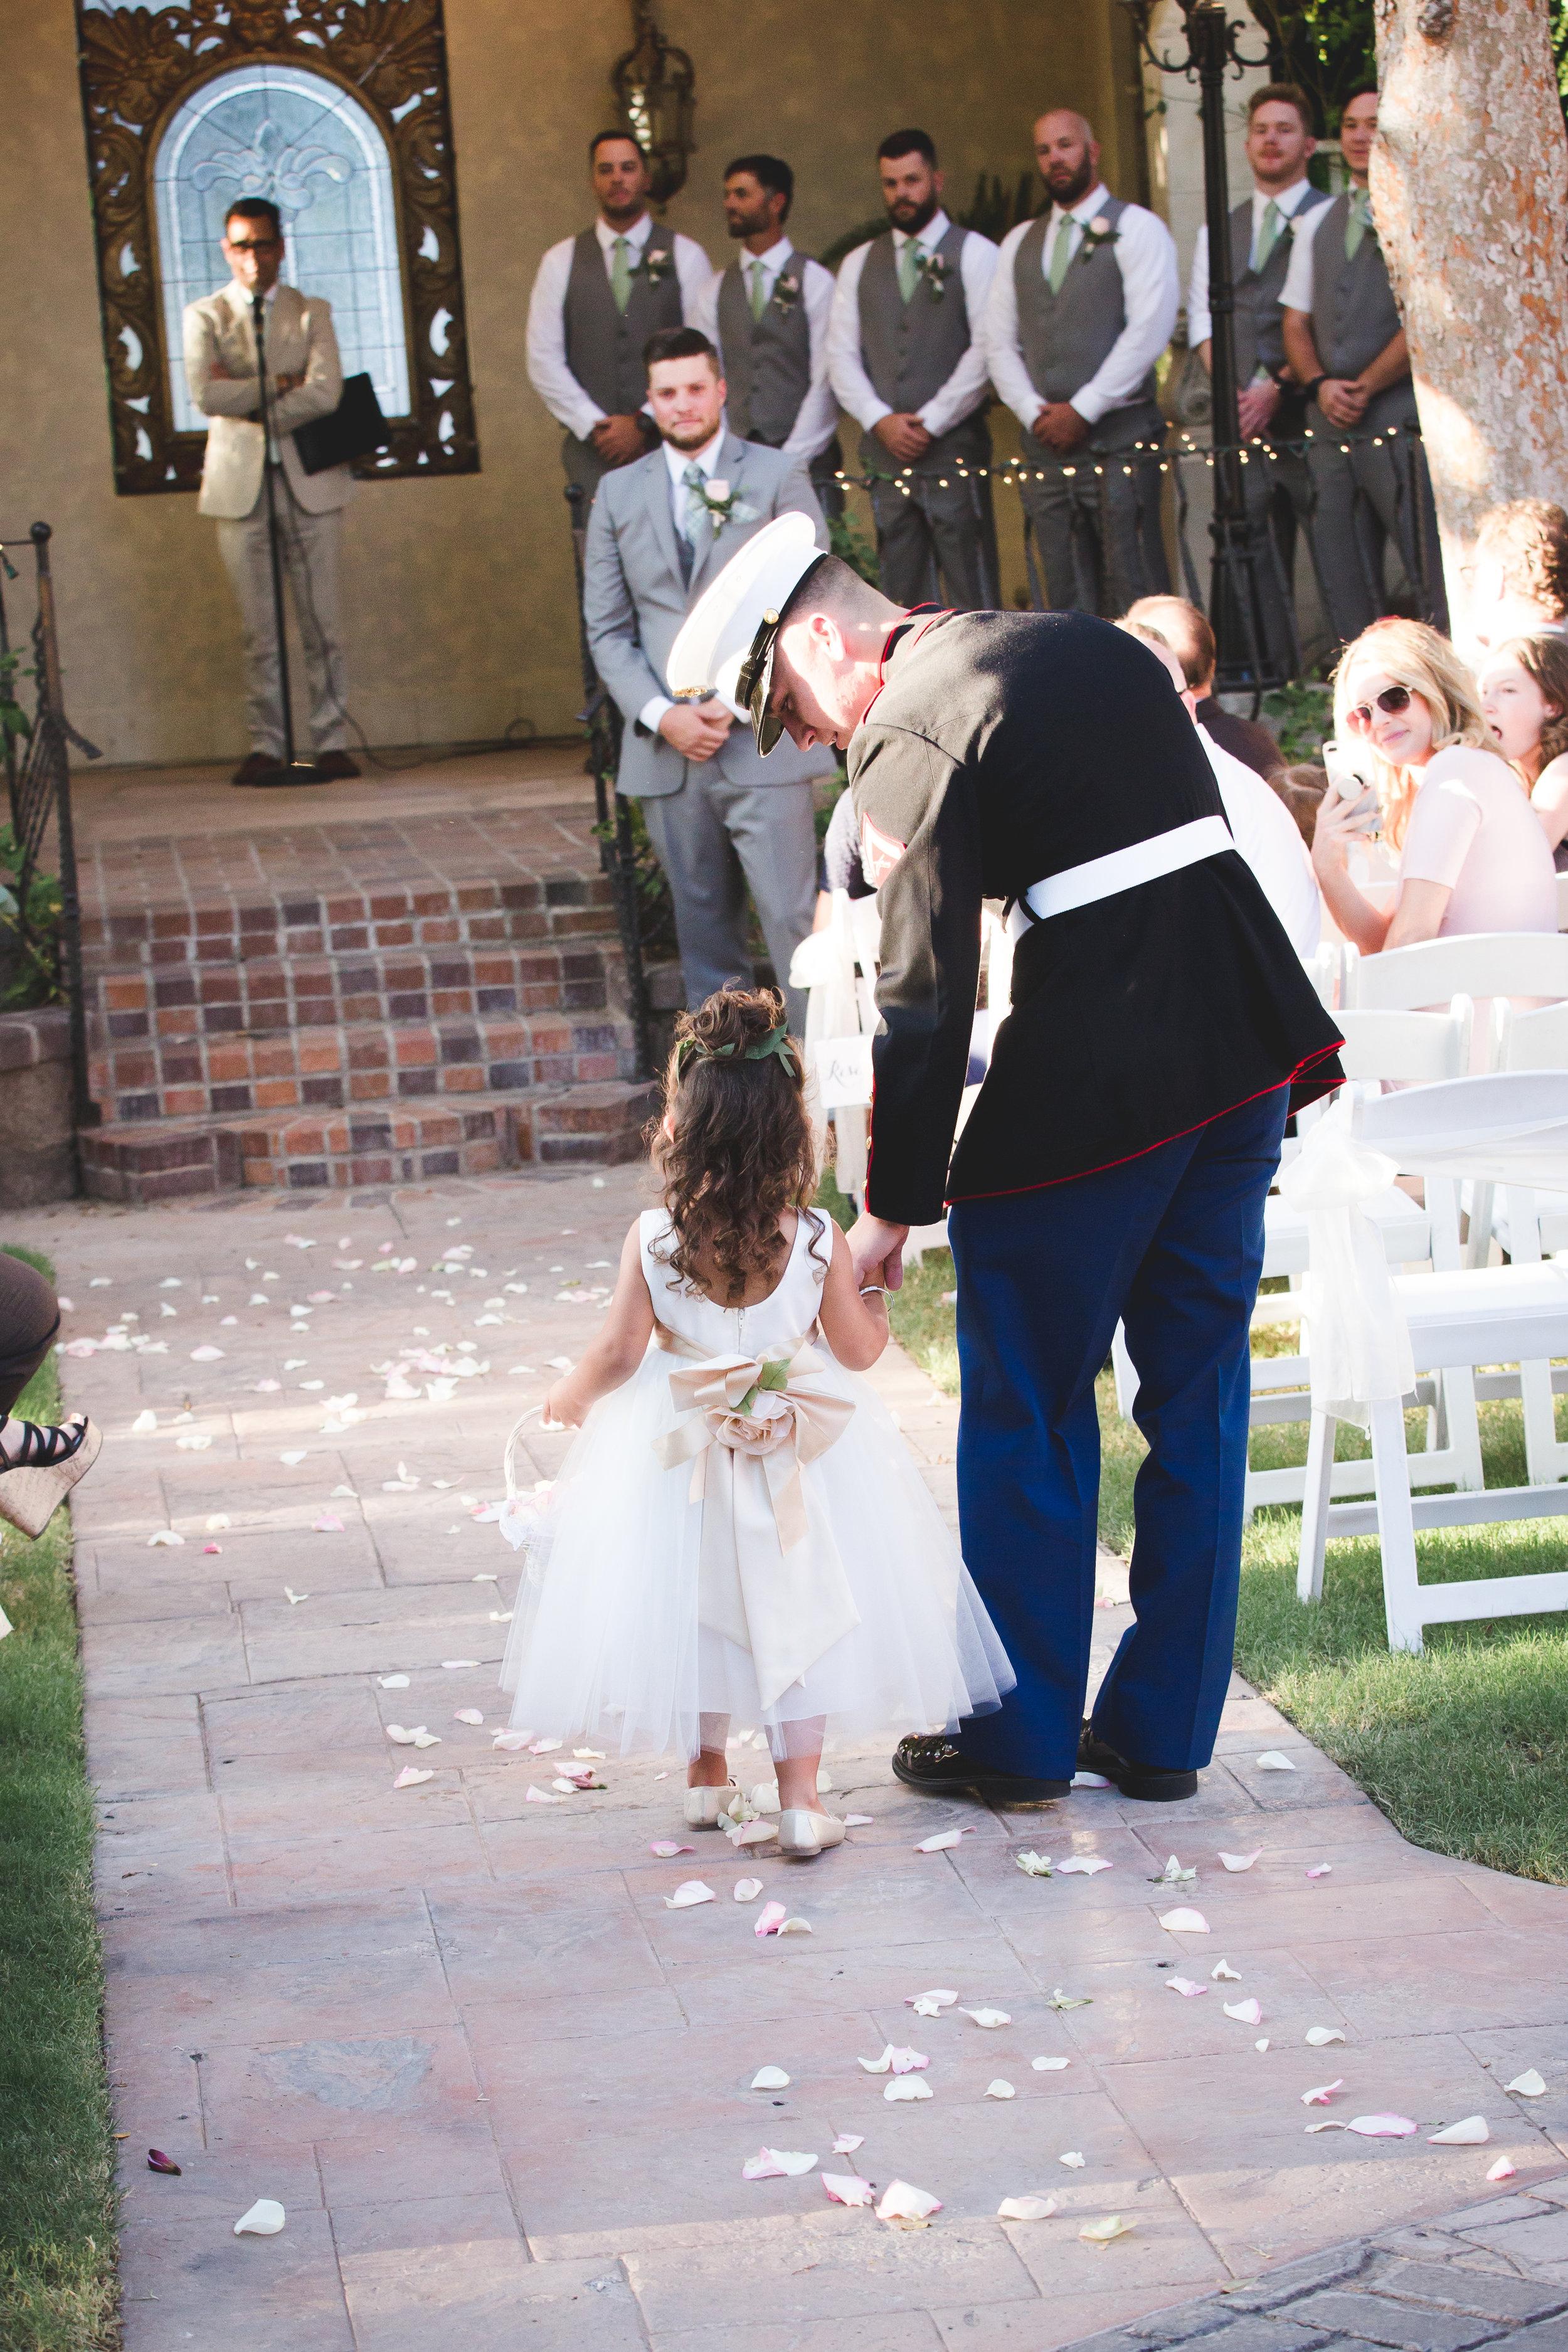 2018-09-07-WEDDING-MCBRIDE-TERRY-153.jpg